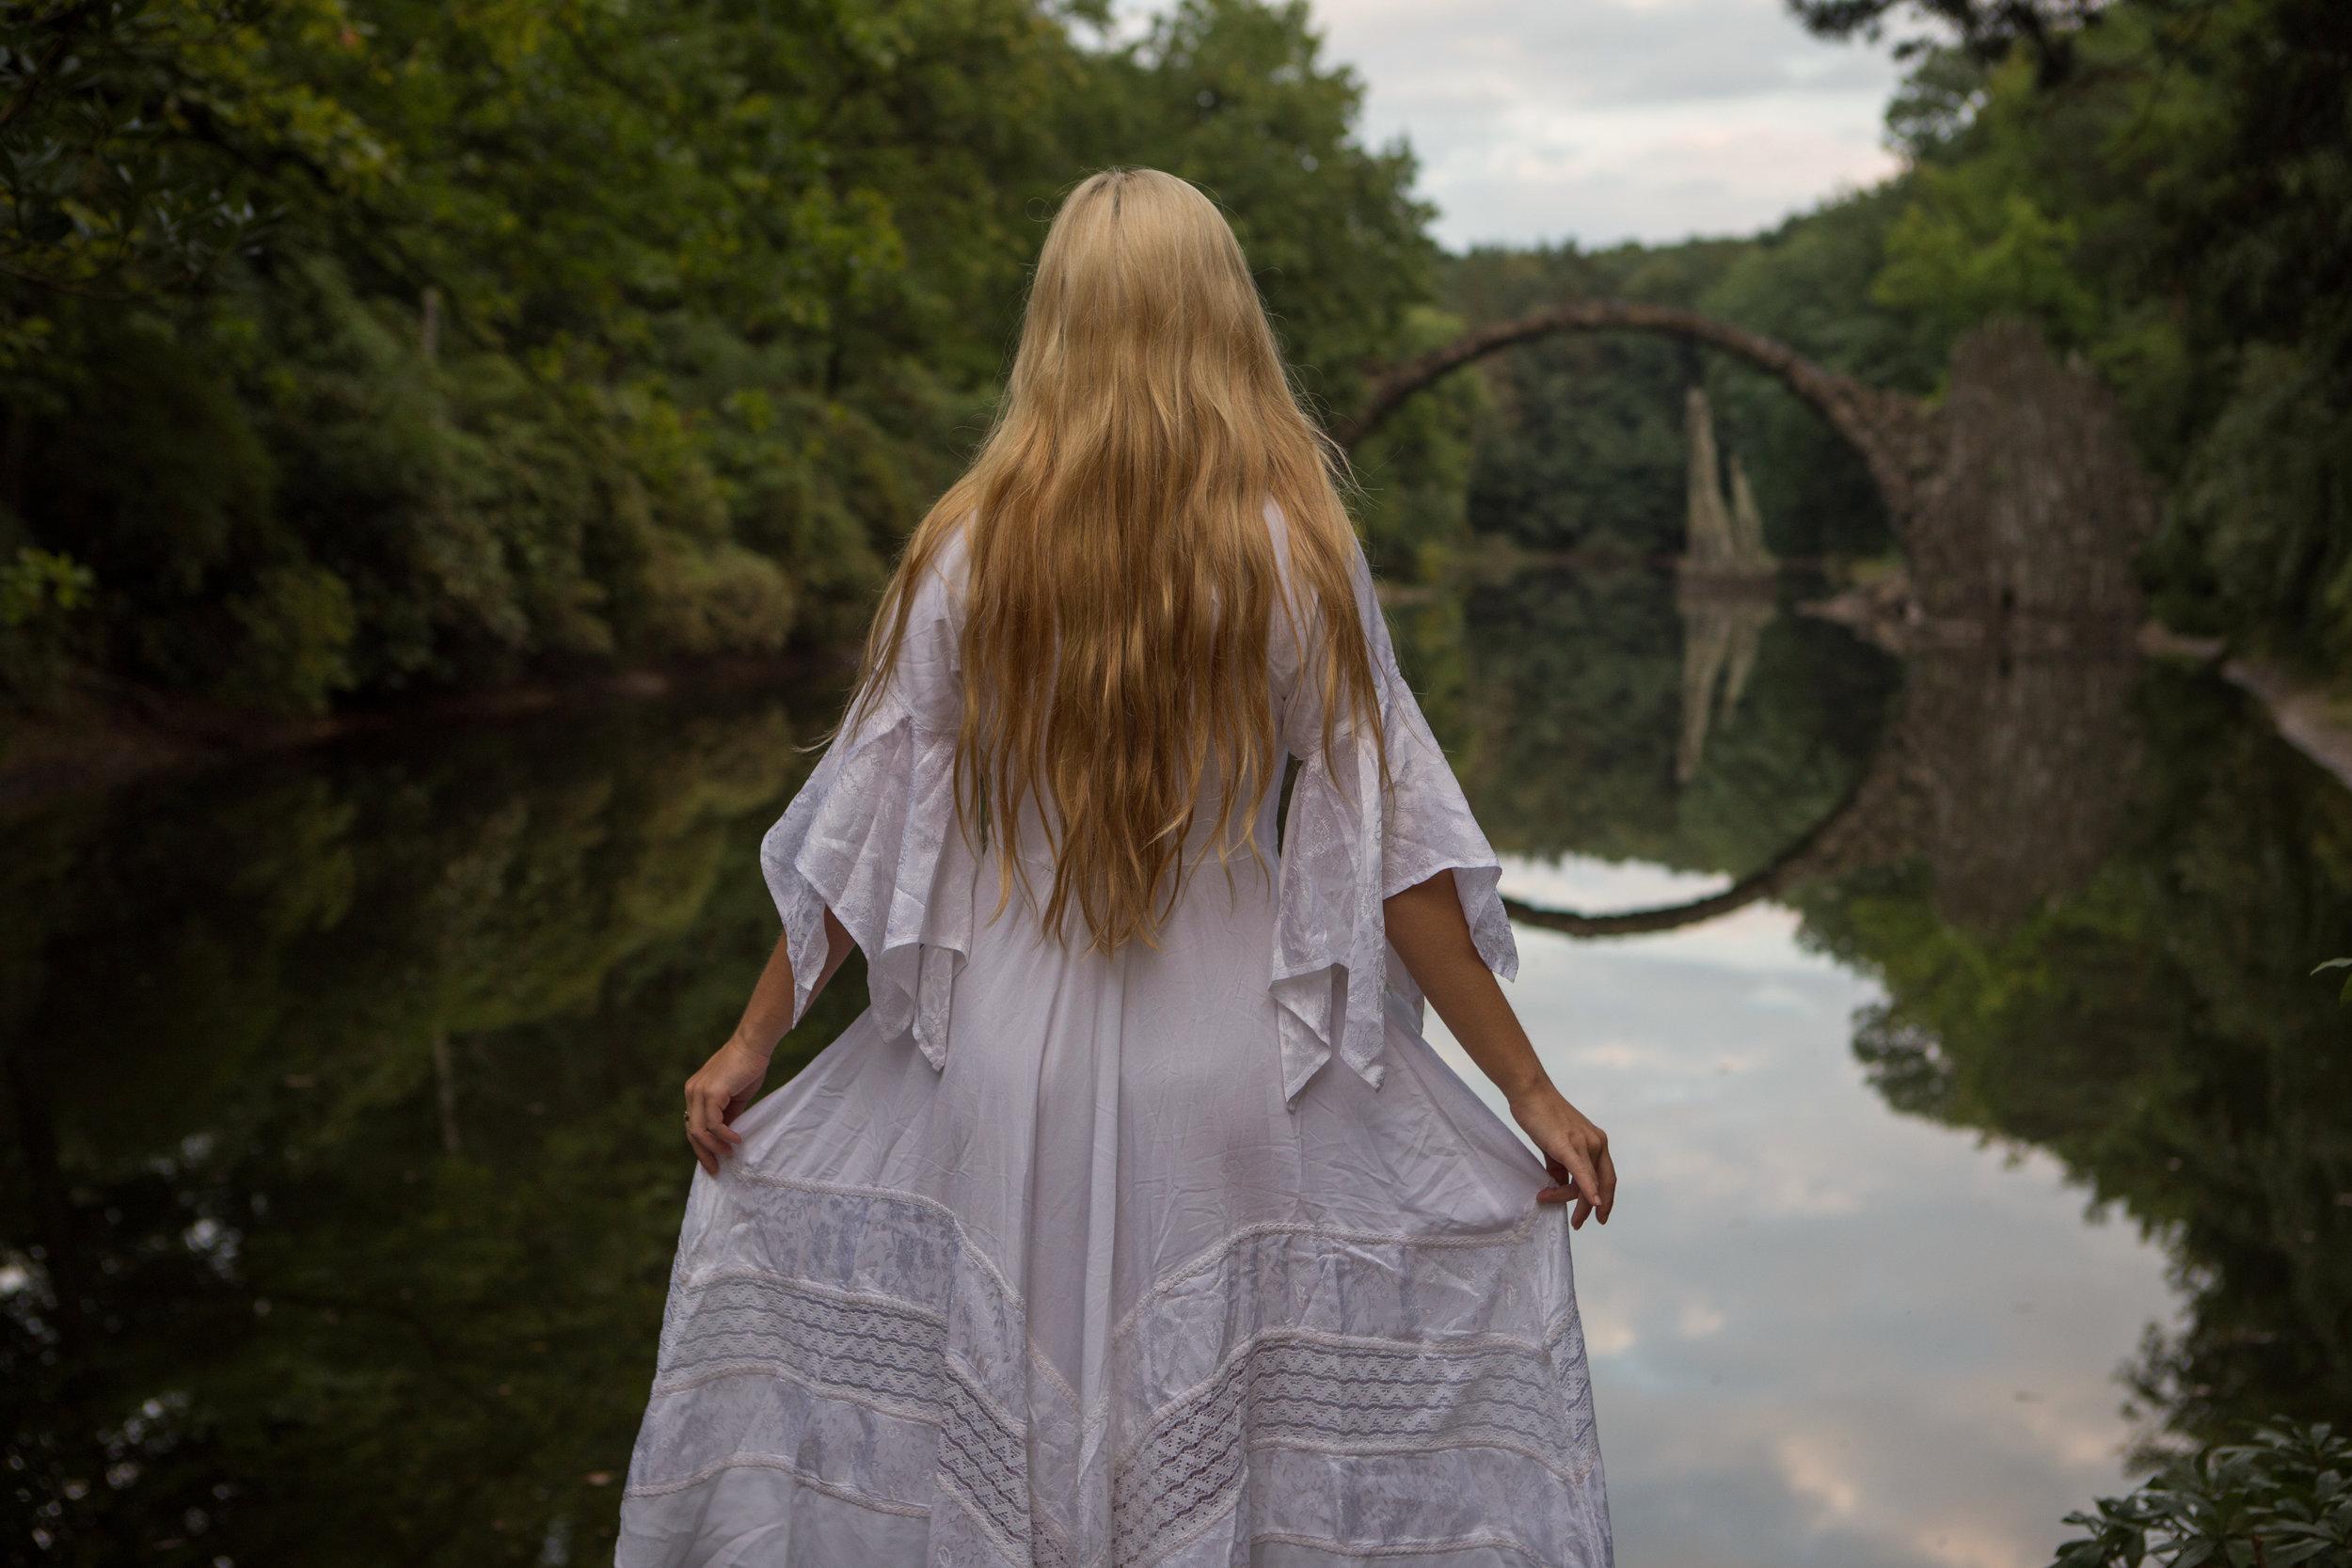 AstroBandit_DariusTwin_Proposal_Kromlau_Germany_Rakotzbrucke_Bridge_Reflection_Ring_WhiteDress_4.jpg